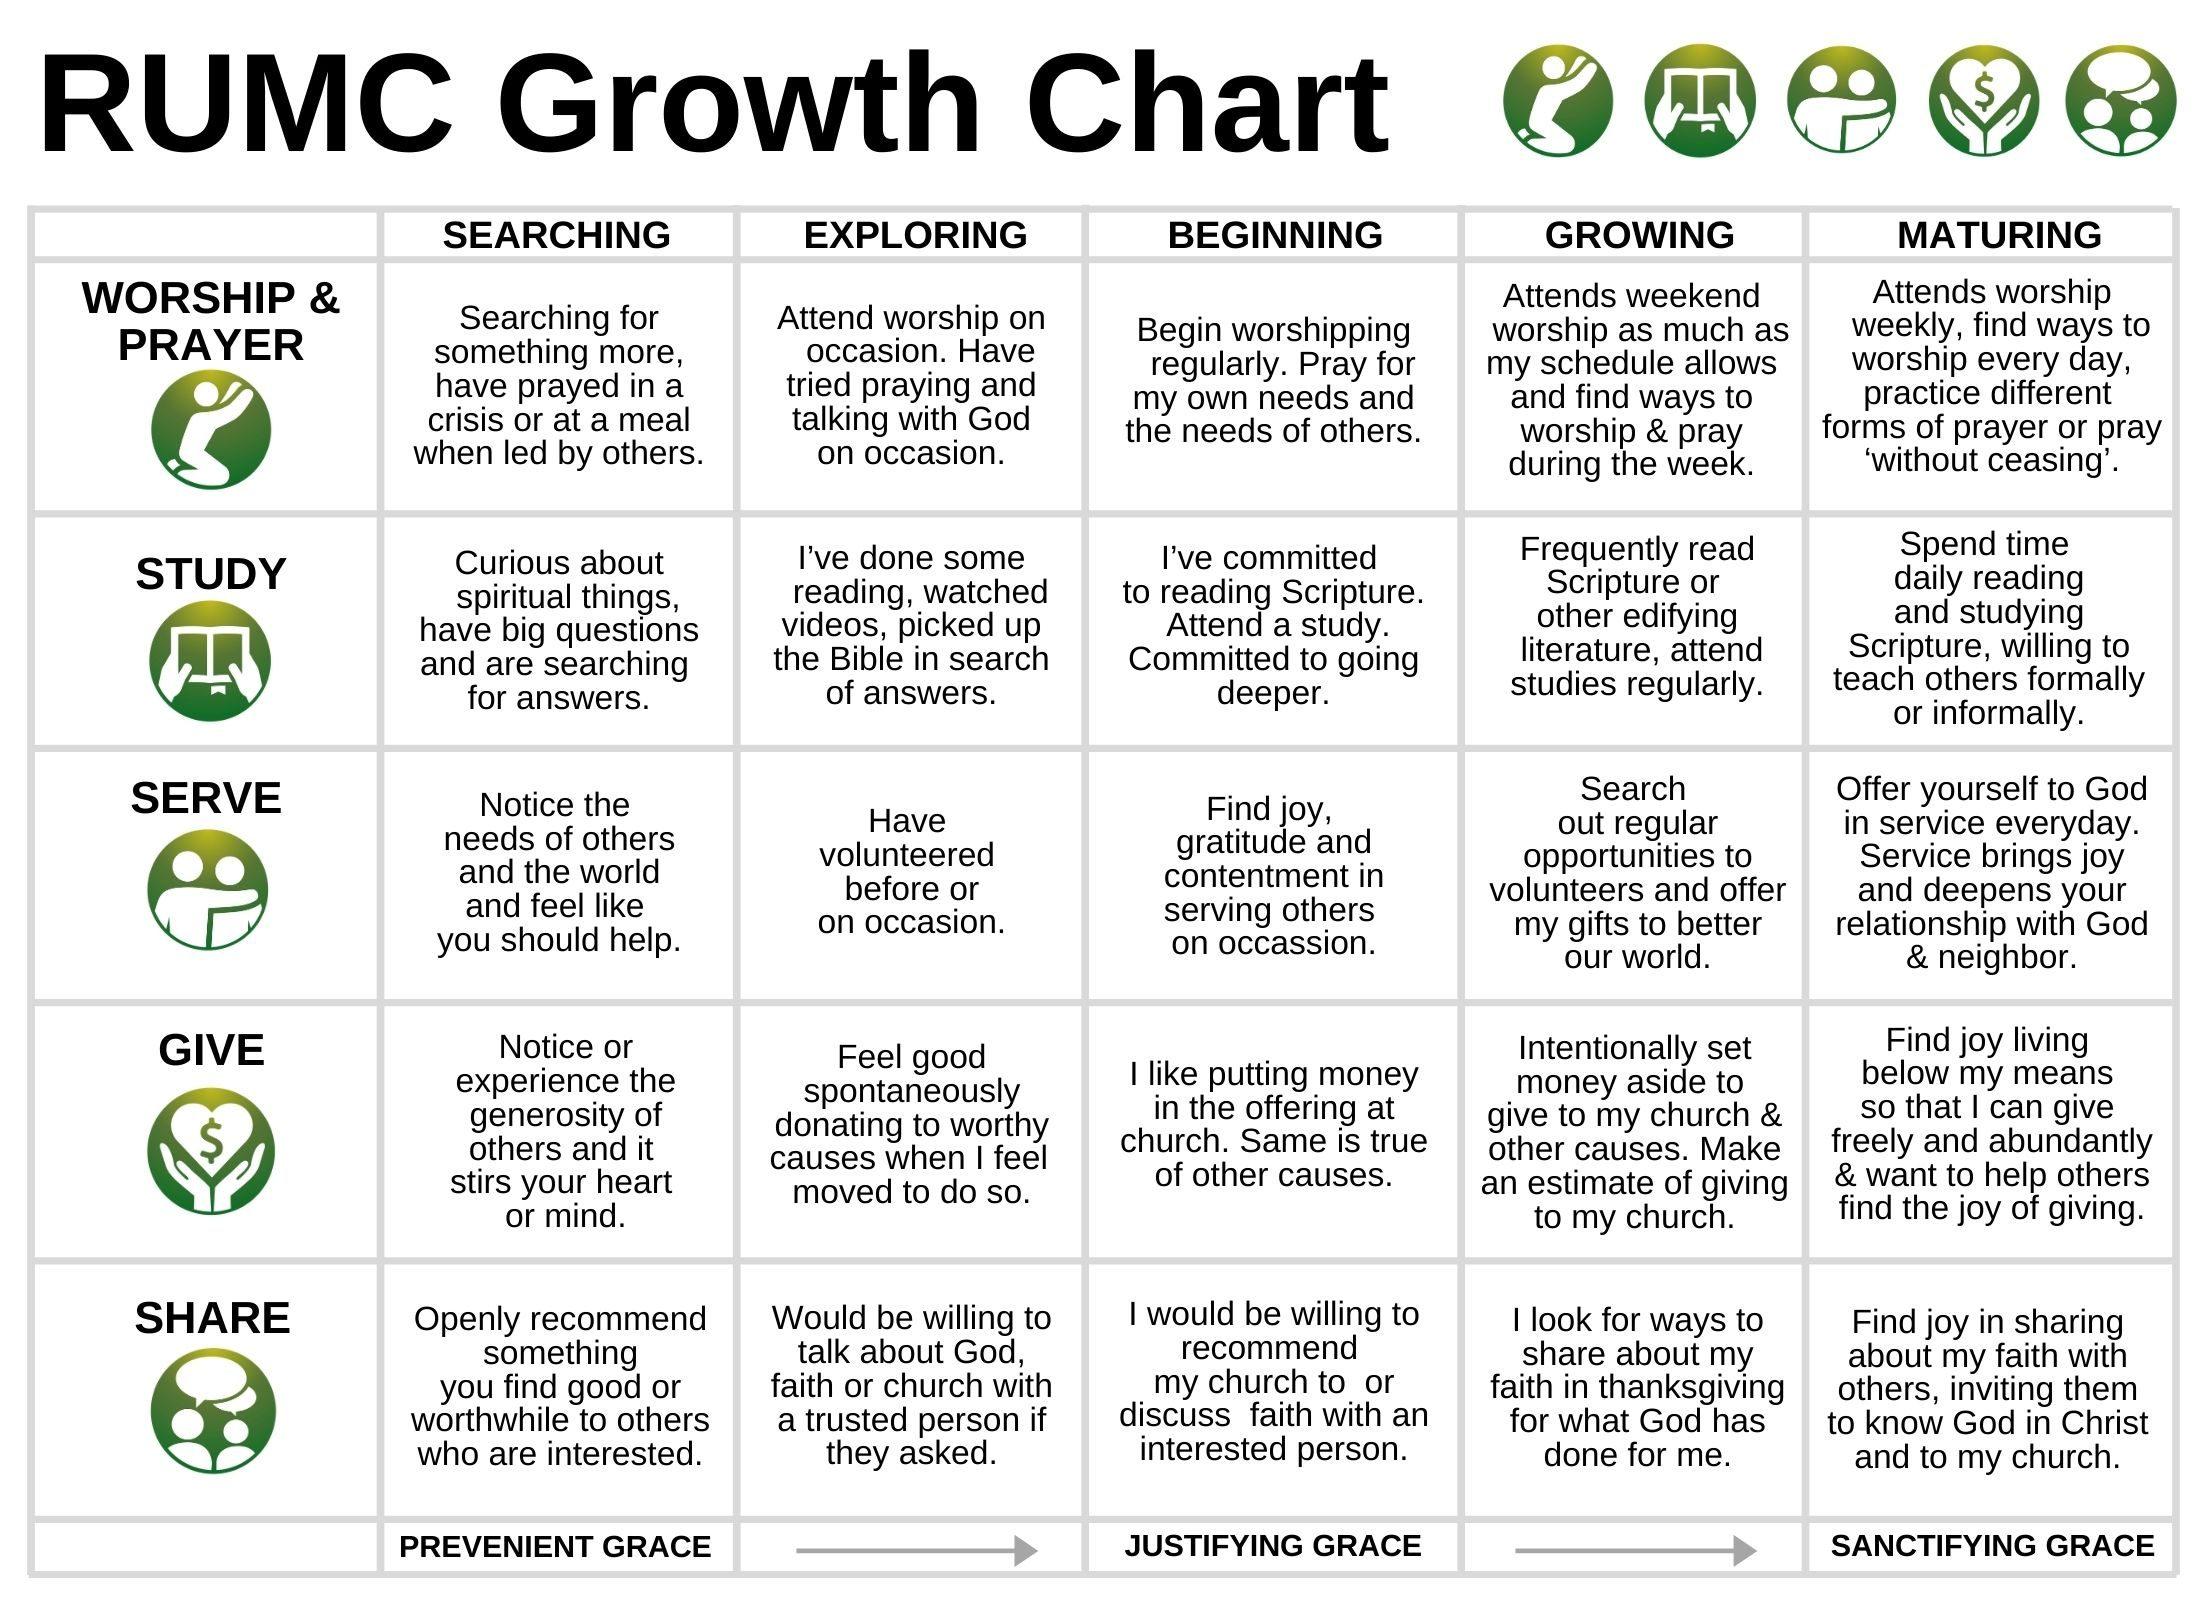 RUMC Growth Chart